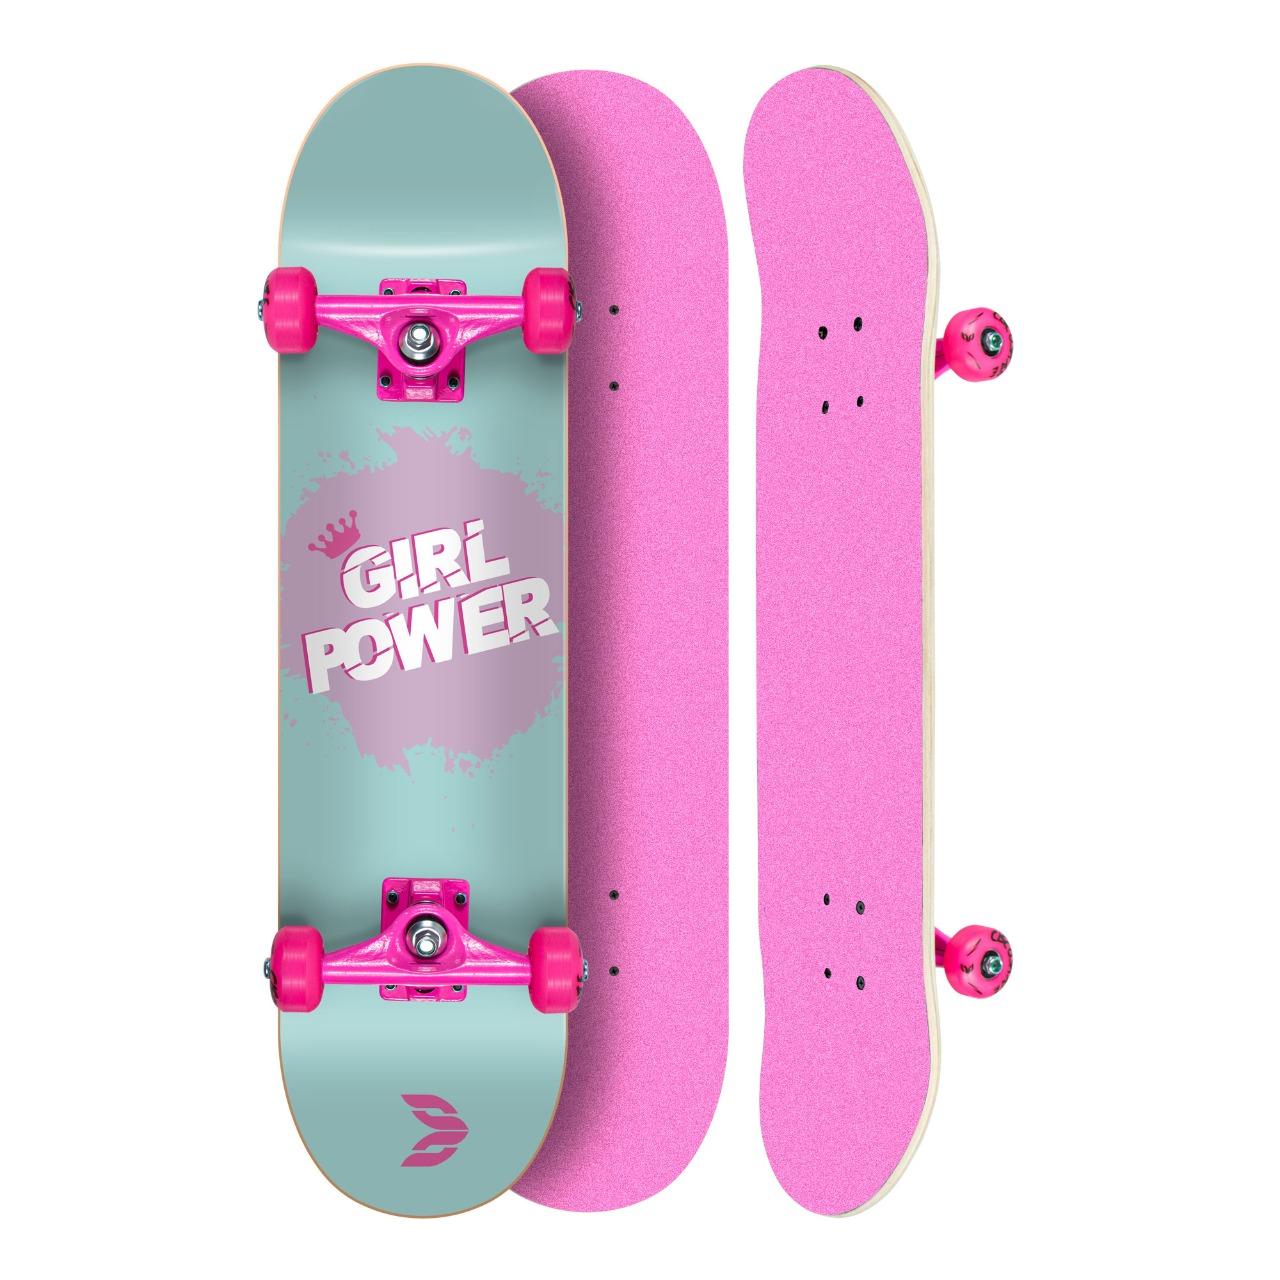 "Skate Montado Profissional Cisco Feminino Girl Power Tifanny - Truck/Roda/Lixa Rosa 8"""